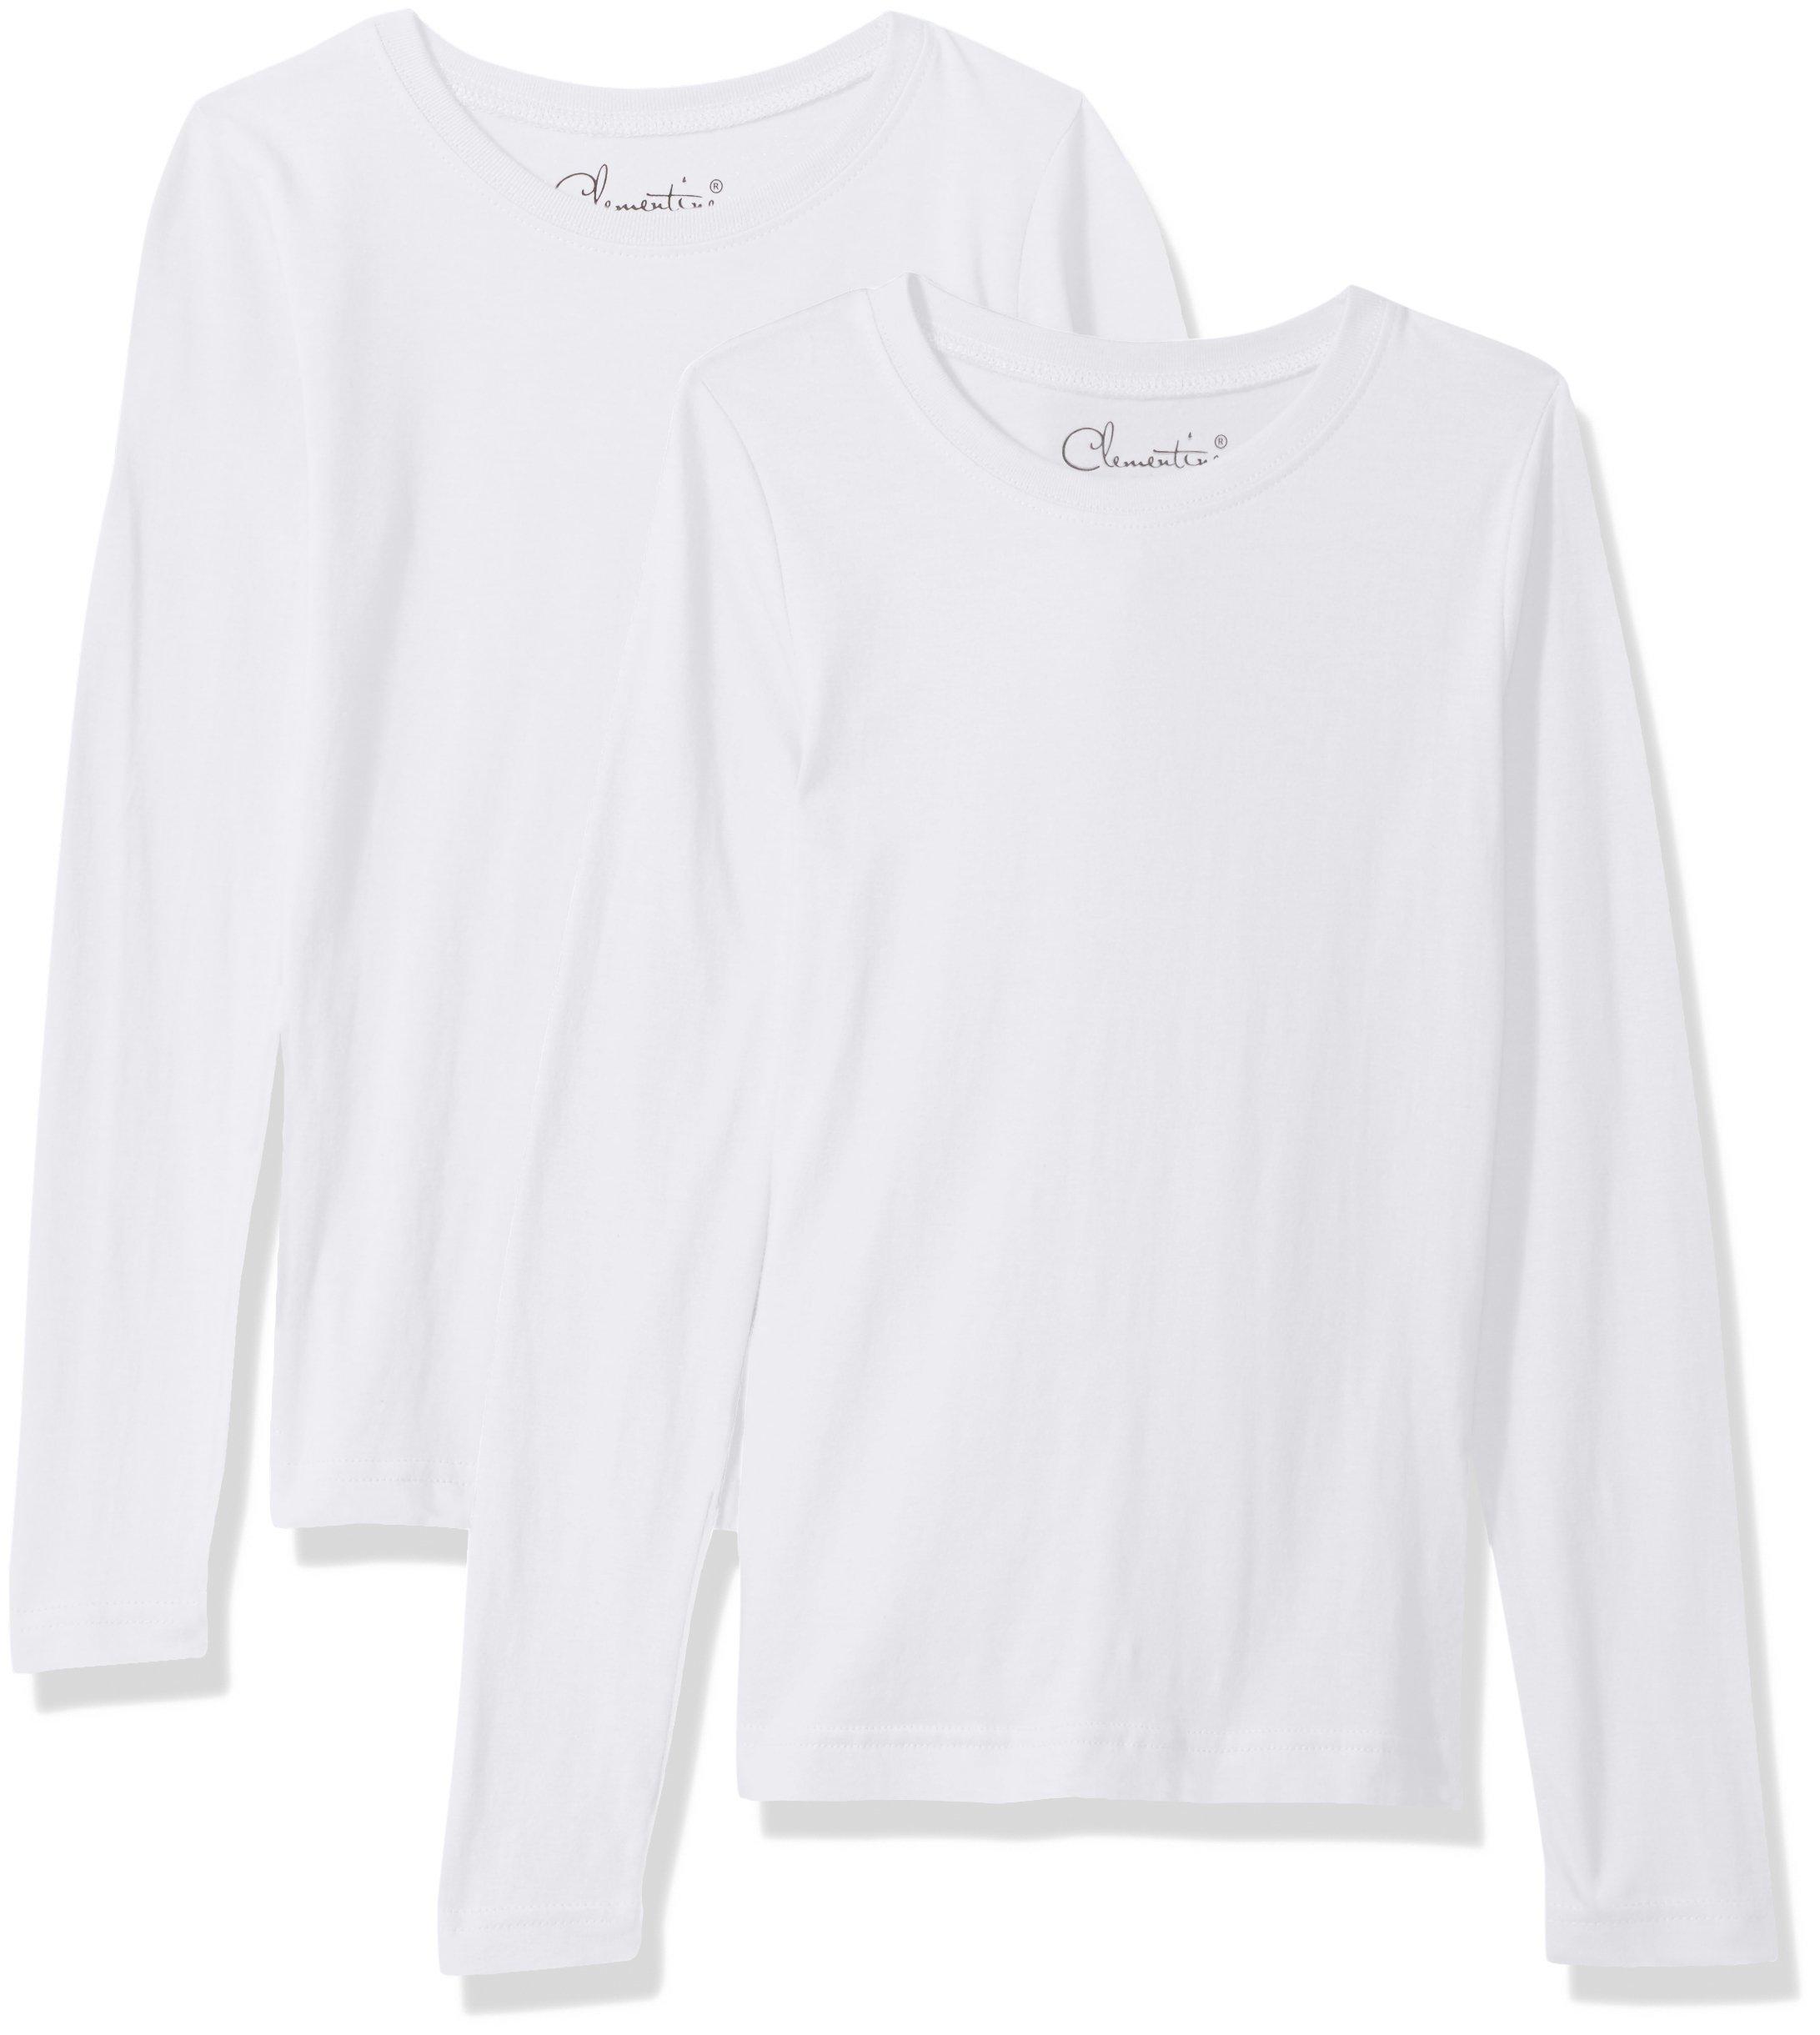 Clementine Big Girls' Everyday T-Shirts Long Sleeve Crew 2-Pack, White/White, M